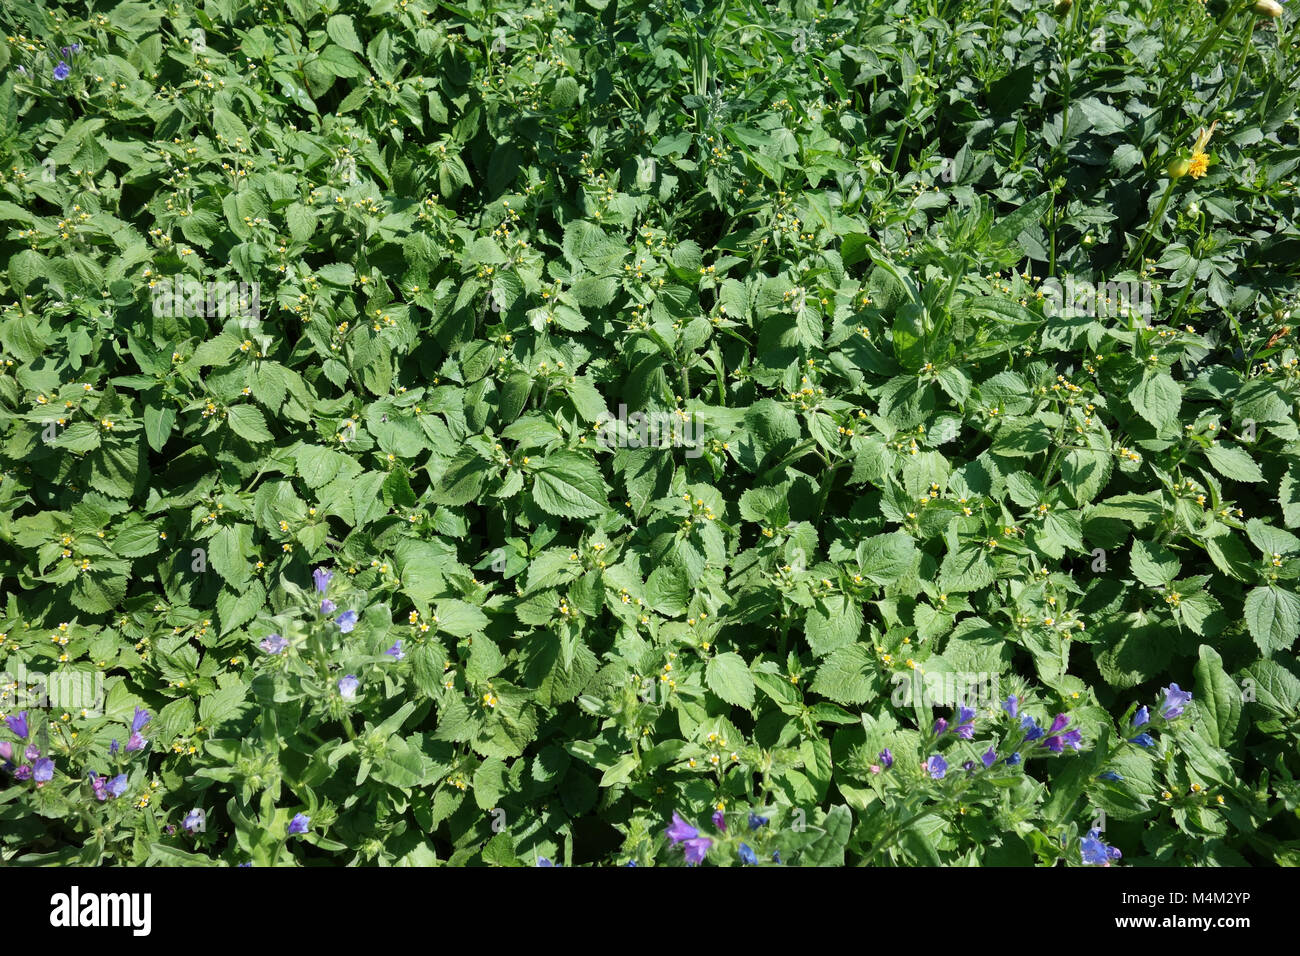 Galinsoga parviflora, gallant soldier - Stock Image